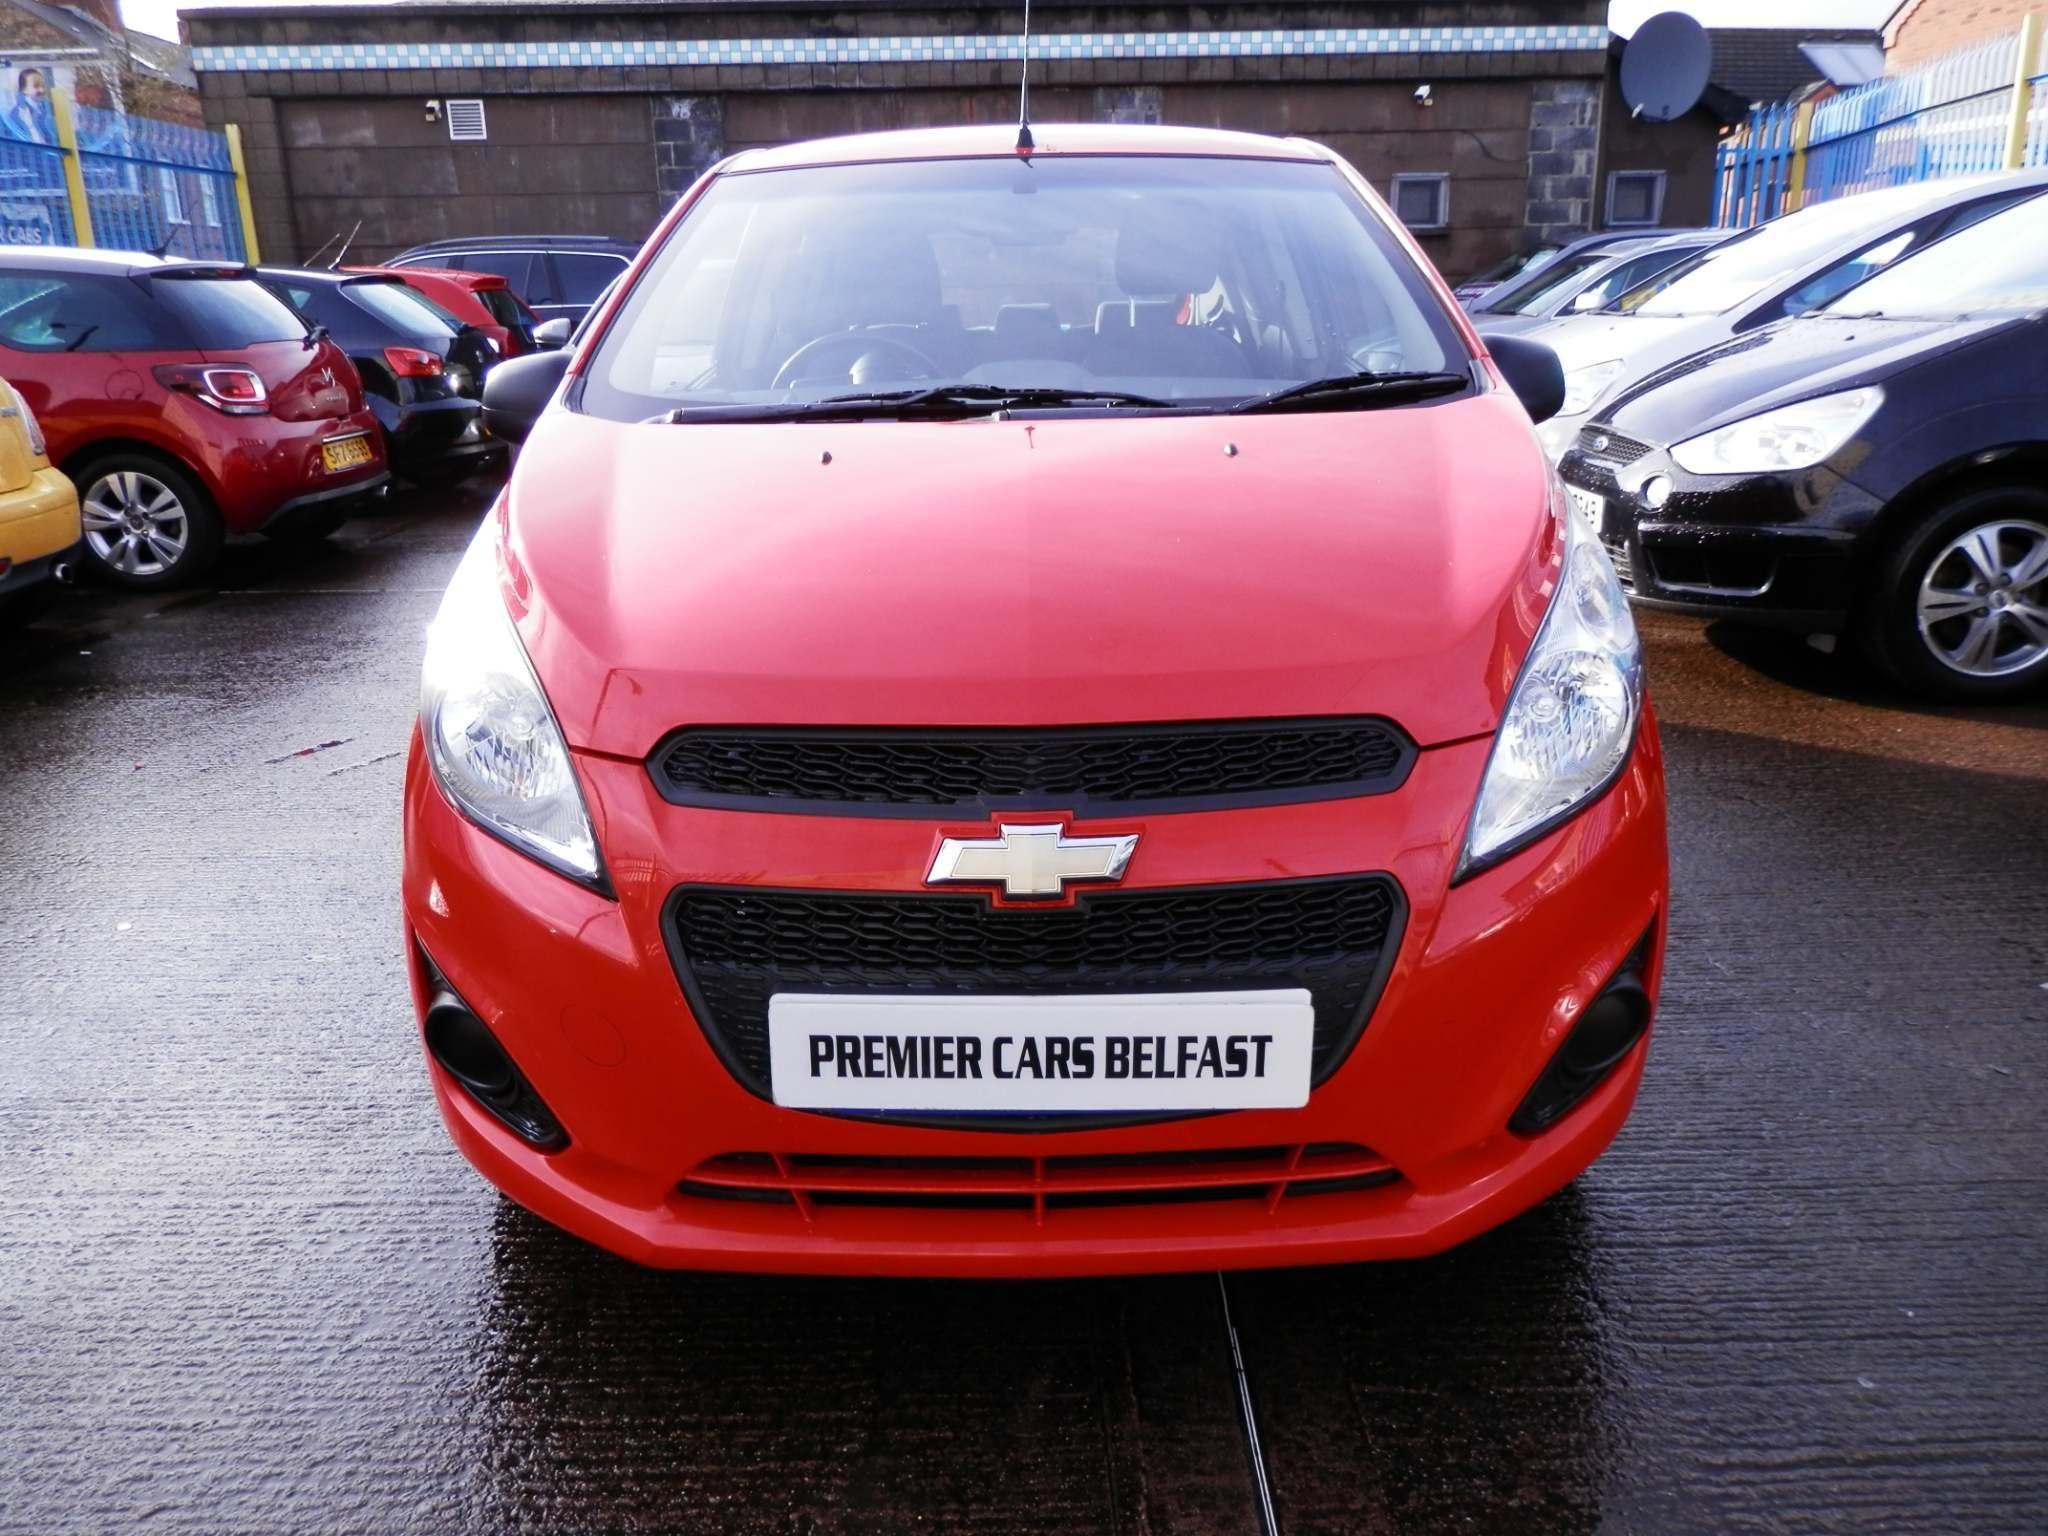 2013 CHEVROLET Spark 1.0 LS Petrol Manual  – Premier Cars Belfast Belfast full